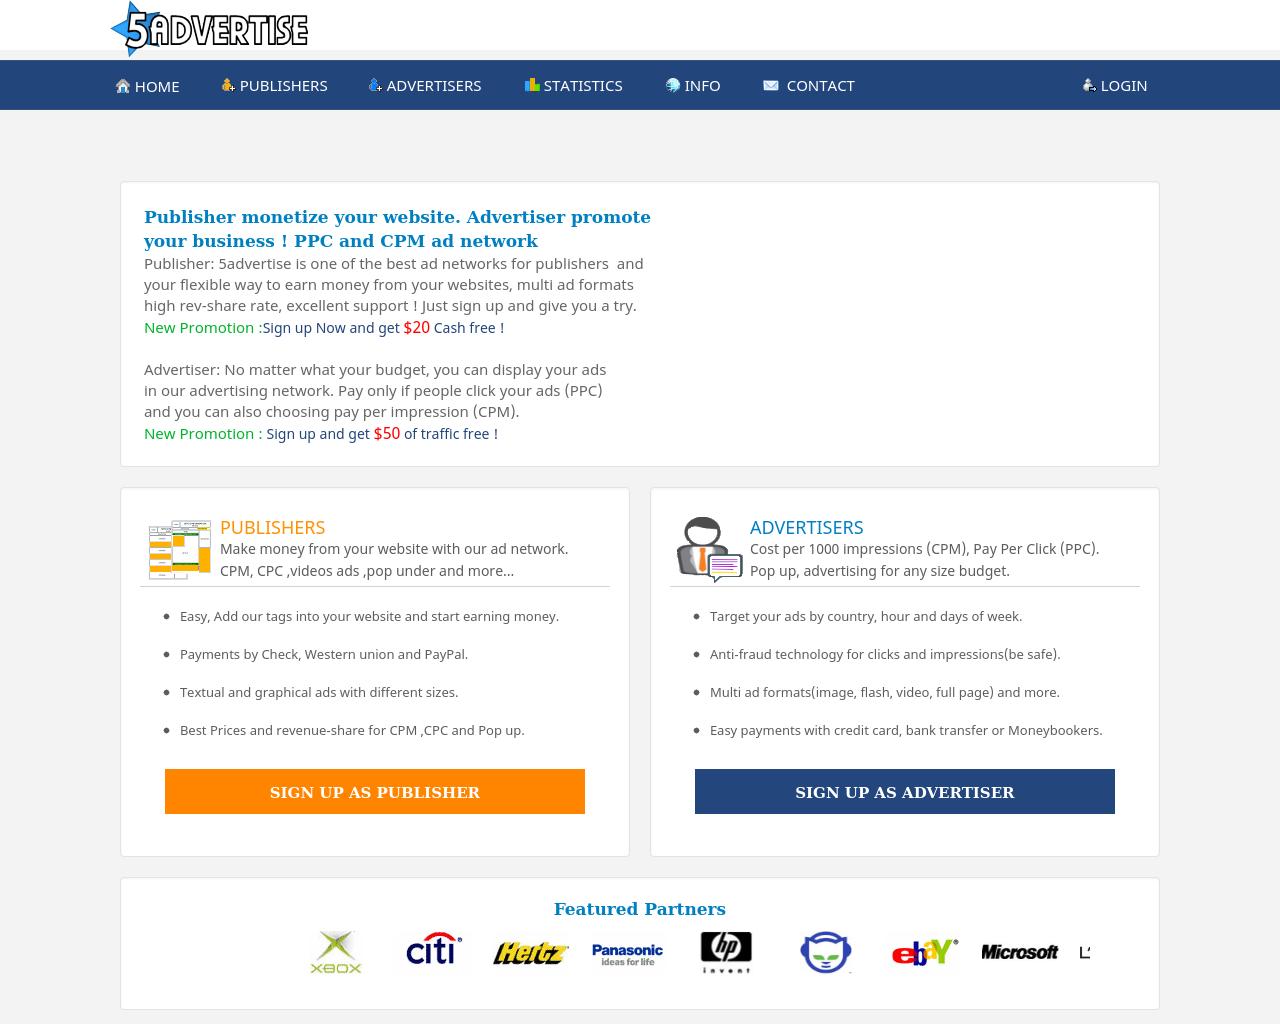 5ADVERTISE-Advertising-Reviews-Pricing